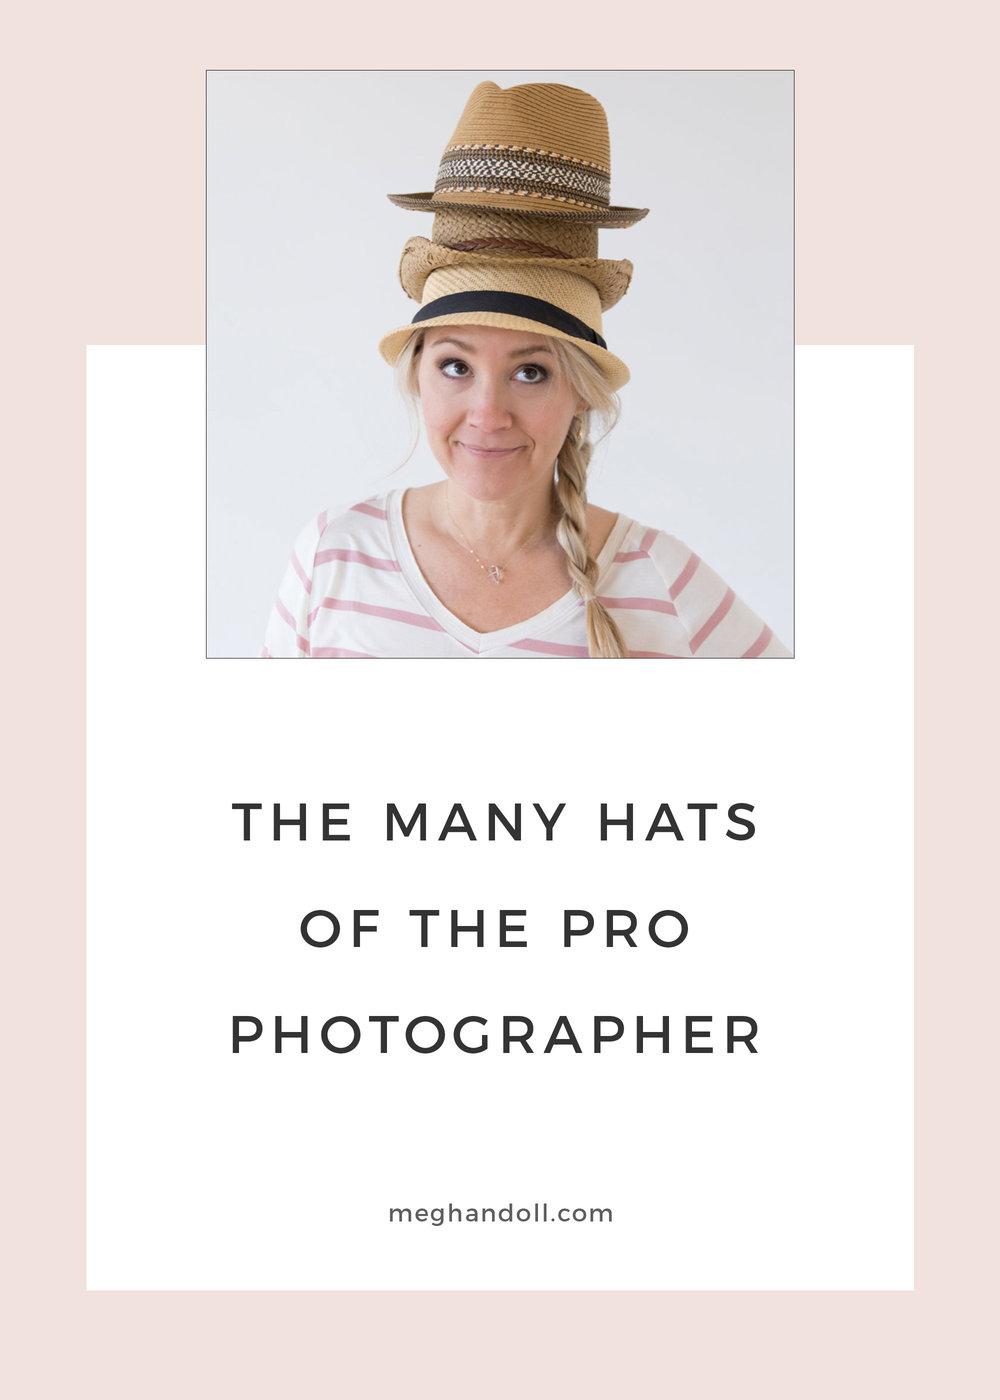 prophotographer.jpg